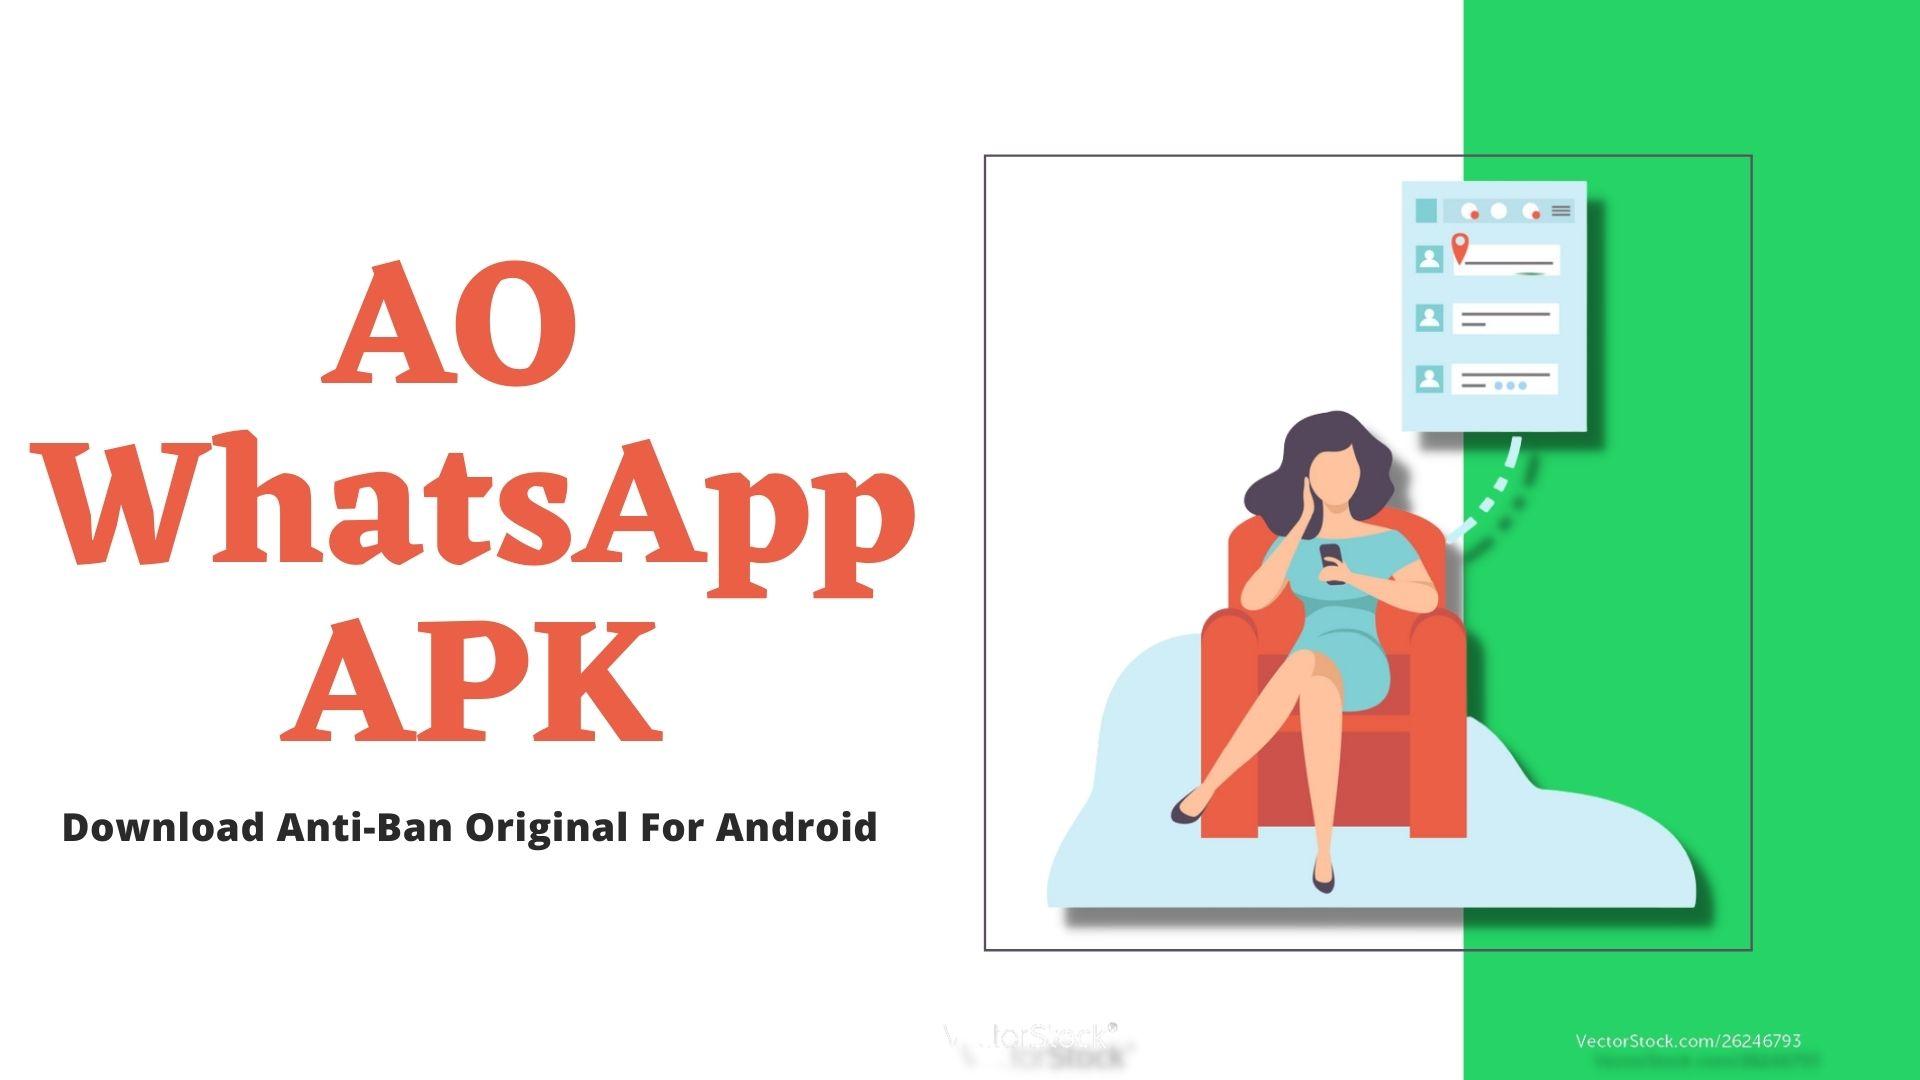 AO WhatsApp APK